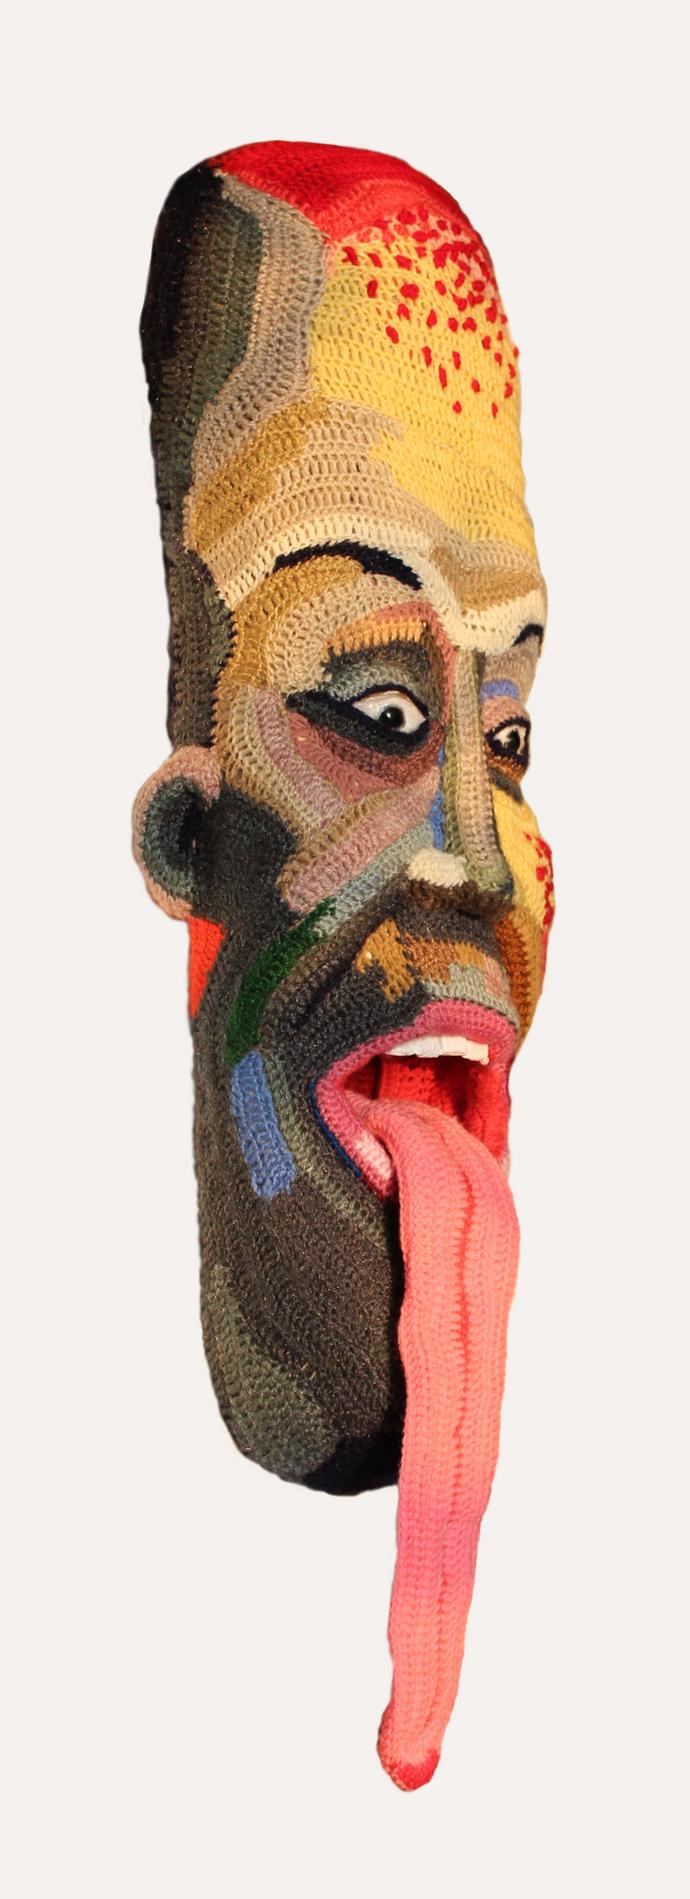 Face 22 by Archana Rajguru, Art Deco Sculpture   3D, Mixed Media, White color